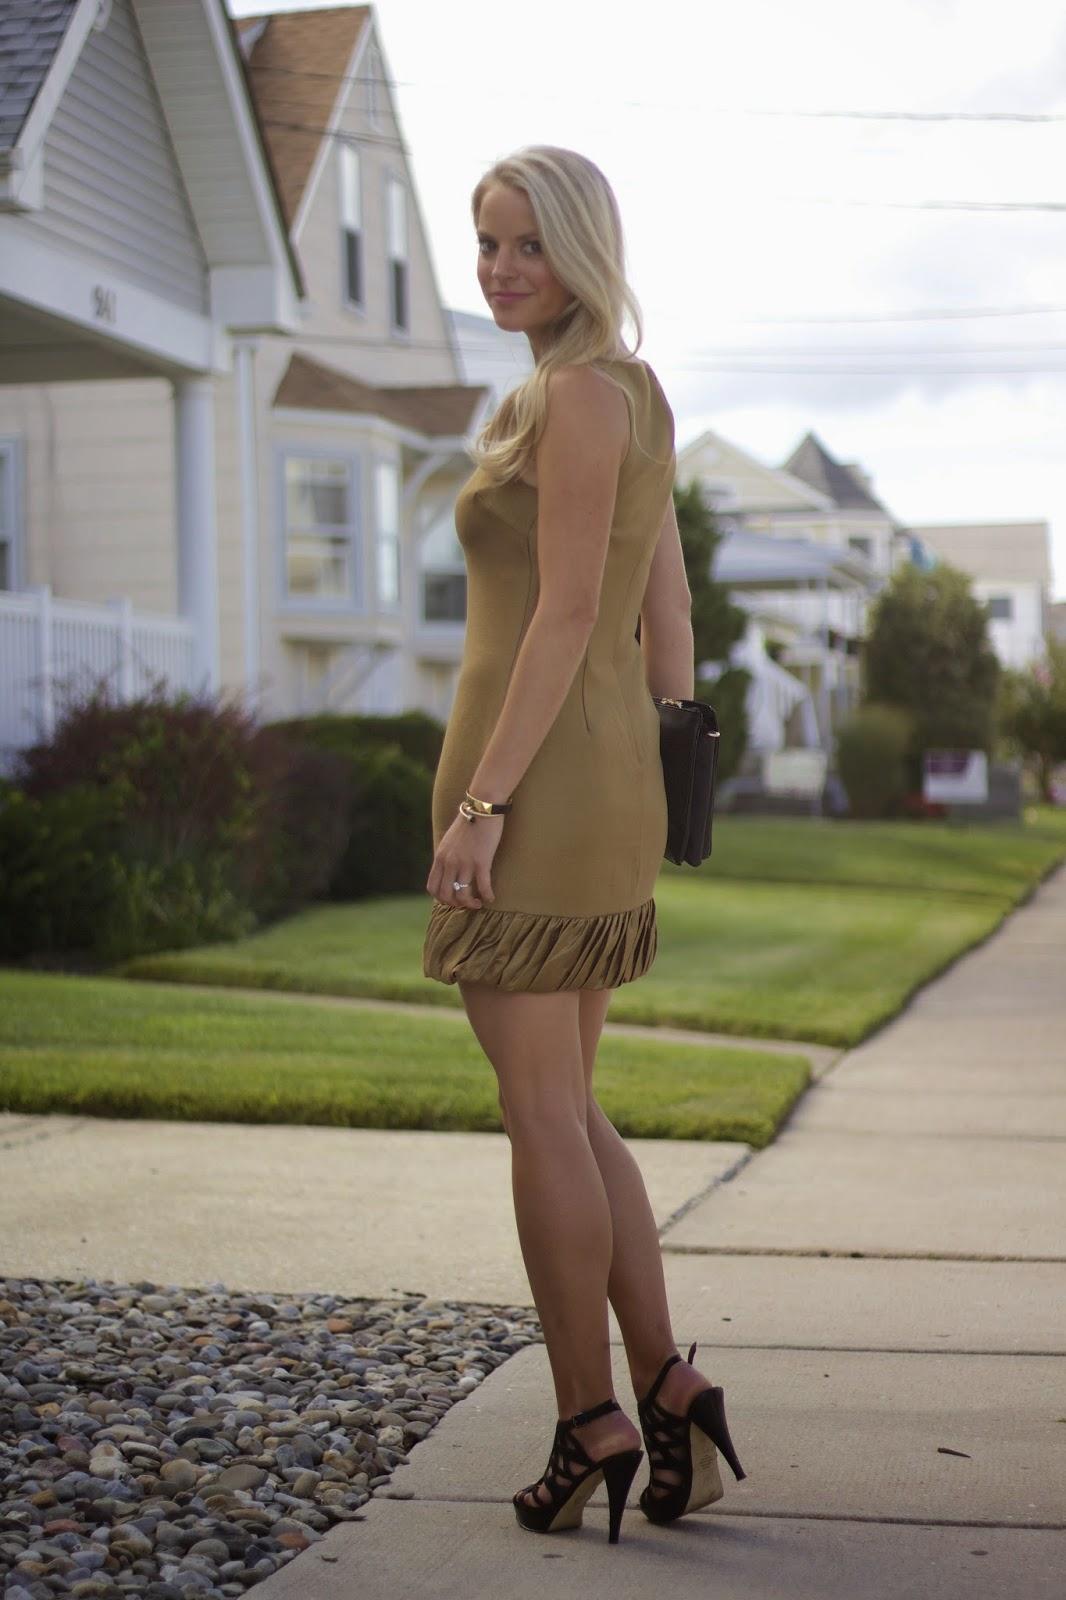 gold dress, wedding guess attire, wedding wear